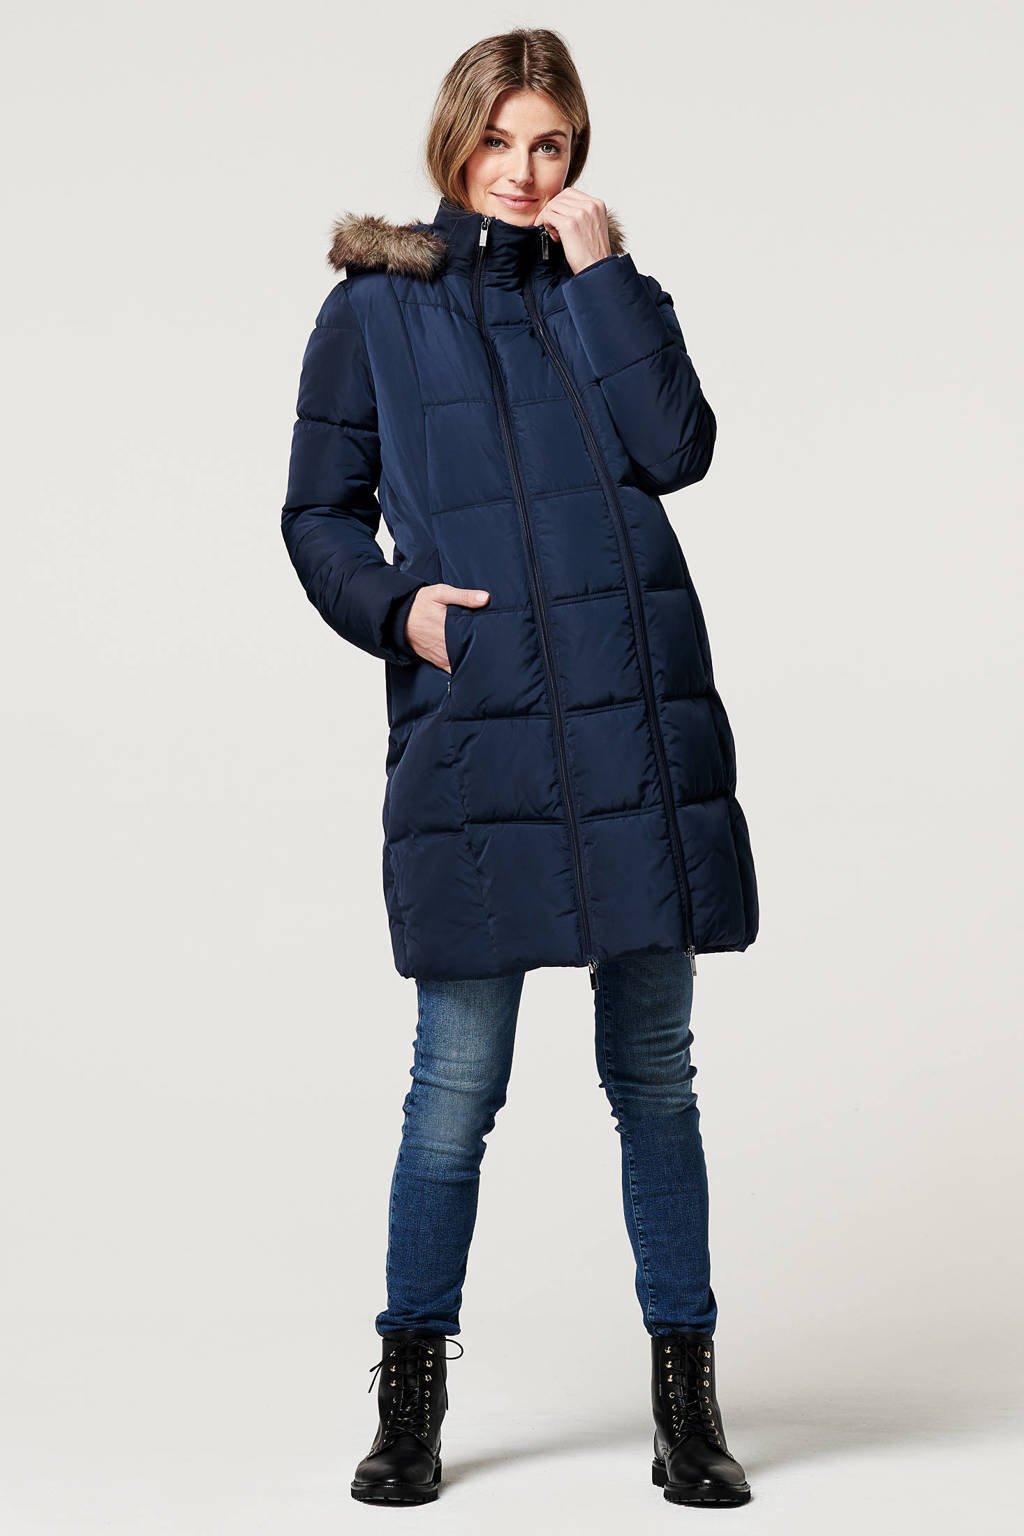 Noppies gewatteerde zwangerschapsjas winter Anna donkerblauw - draagjas, Donkerblauw